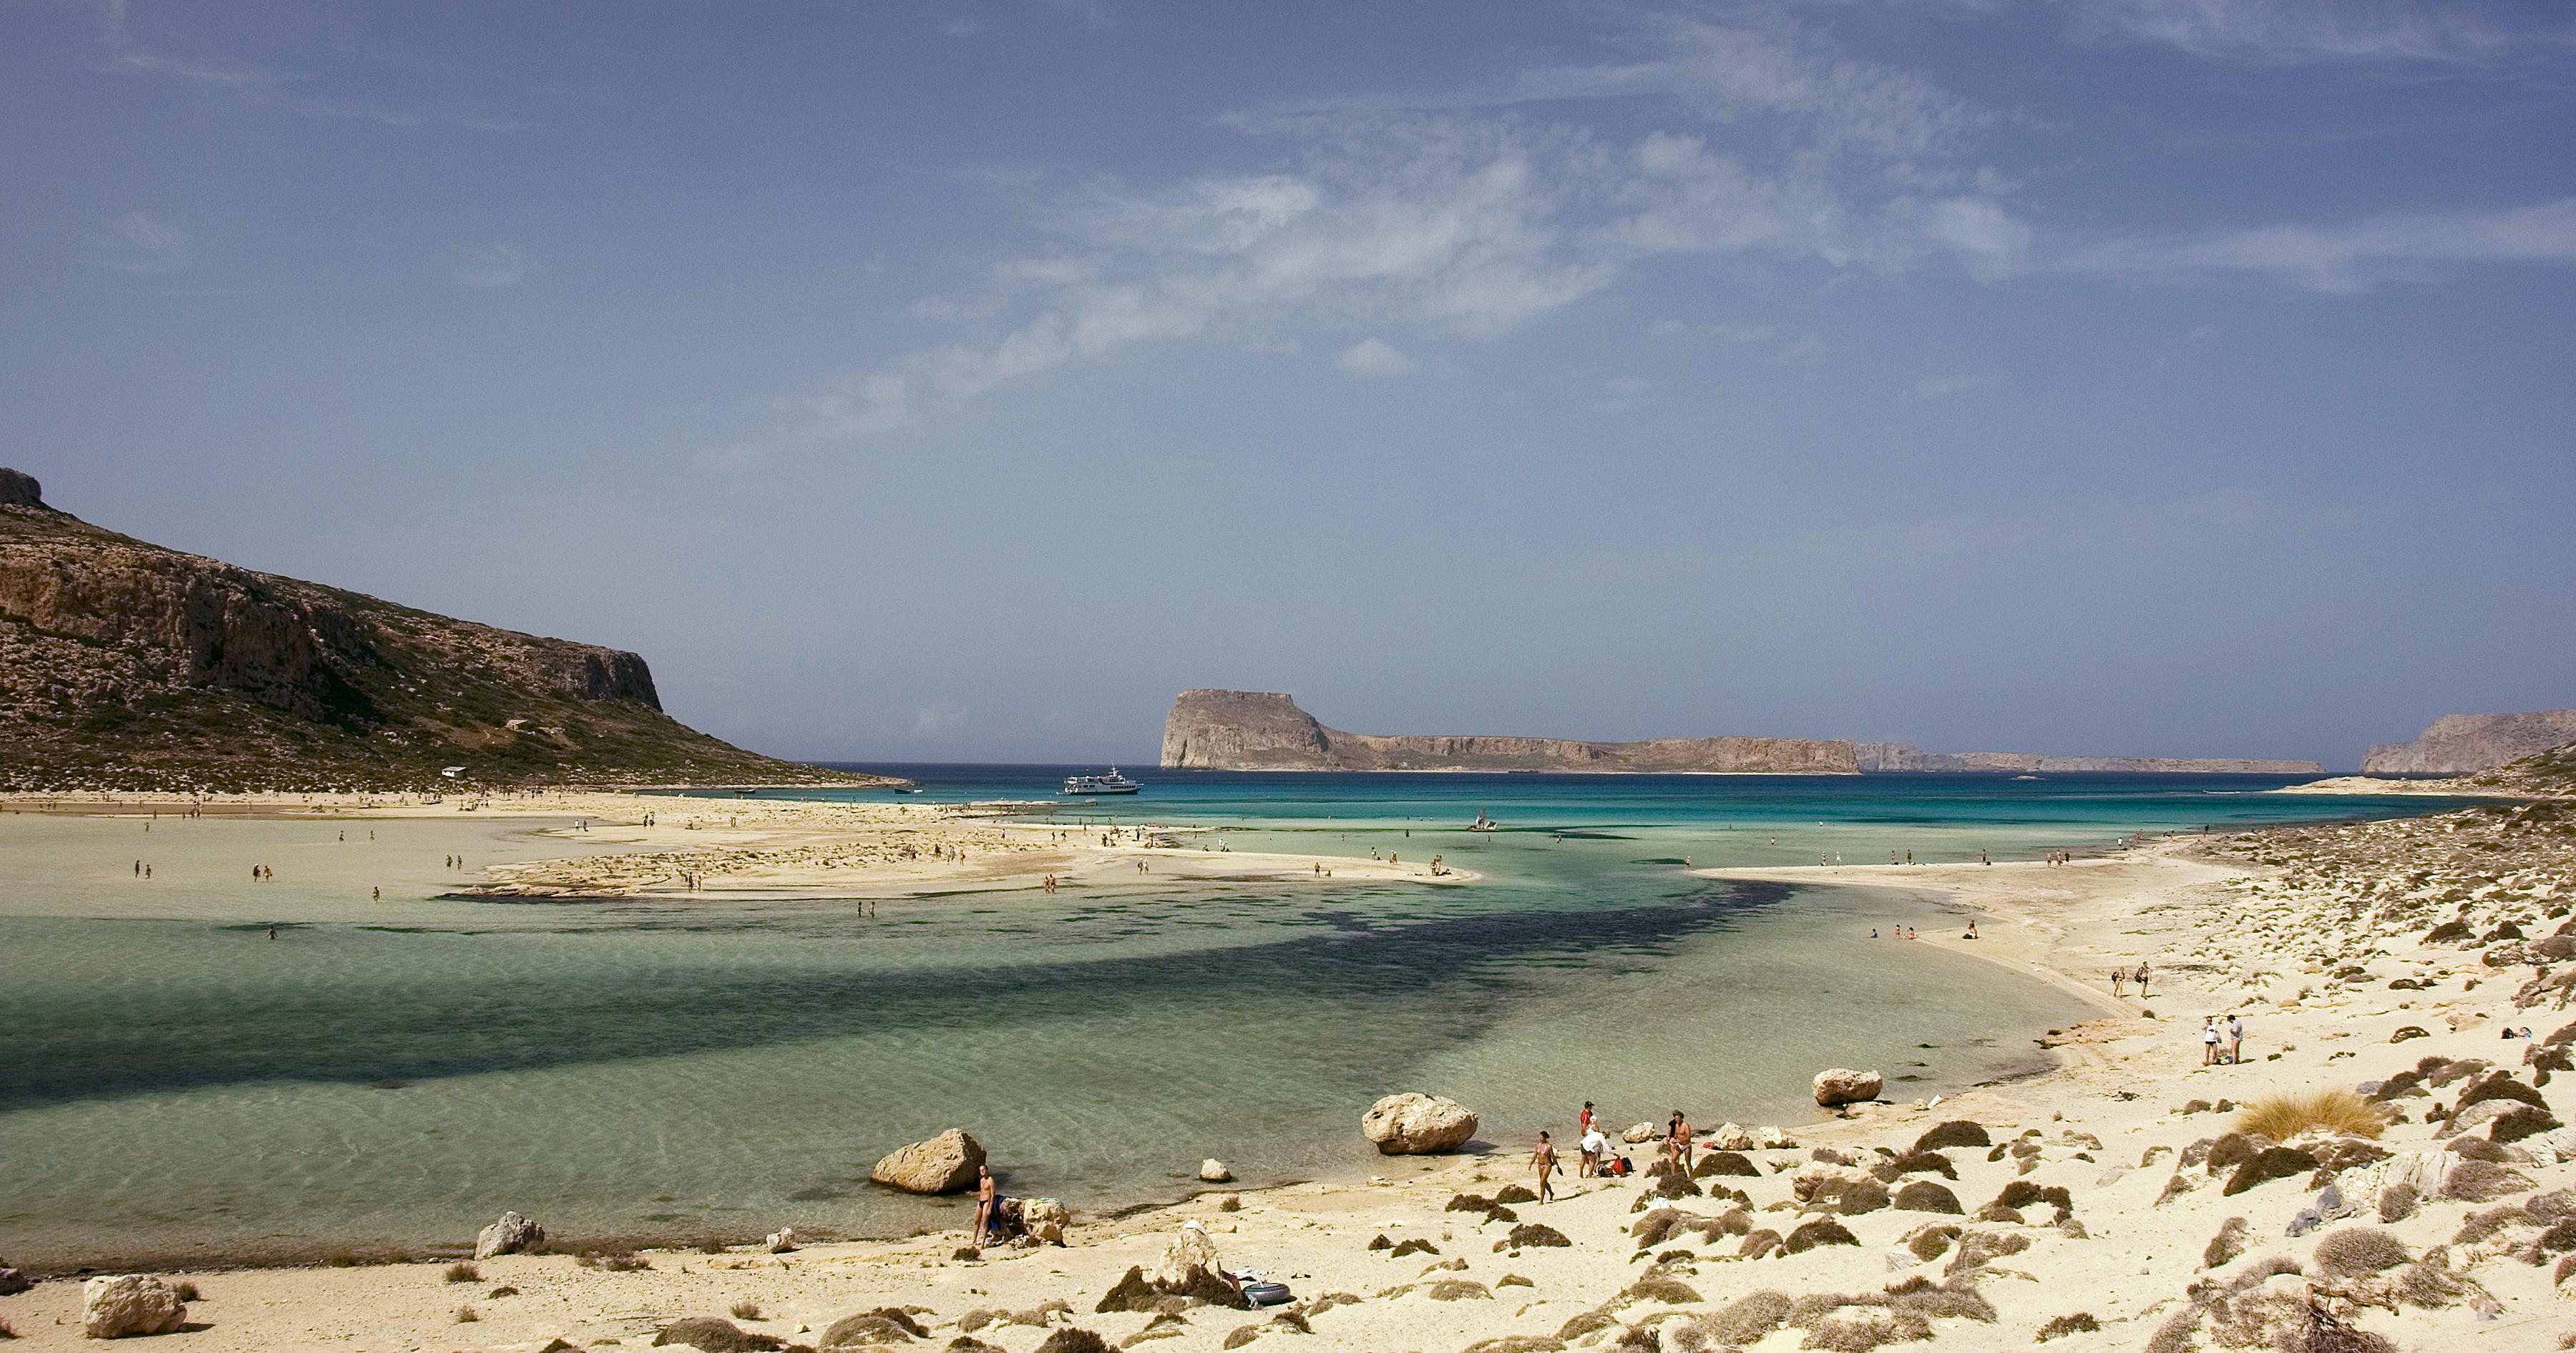 Crete - Balos, 2008